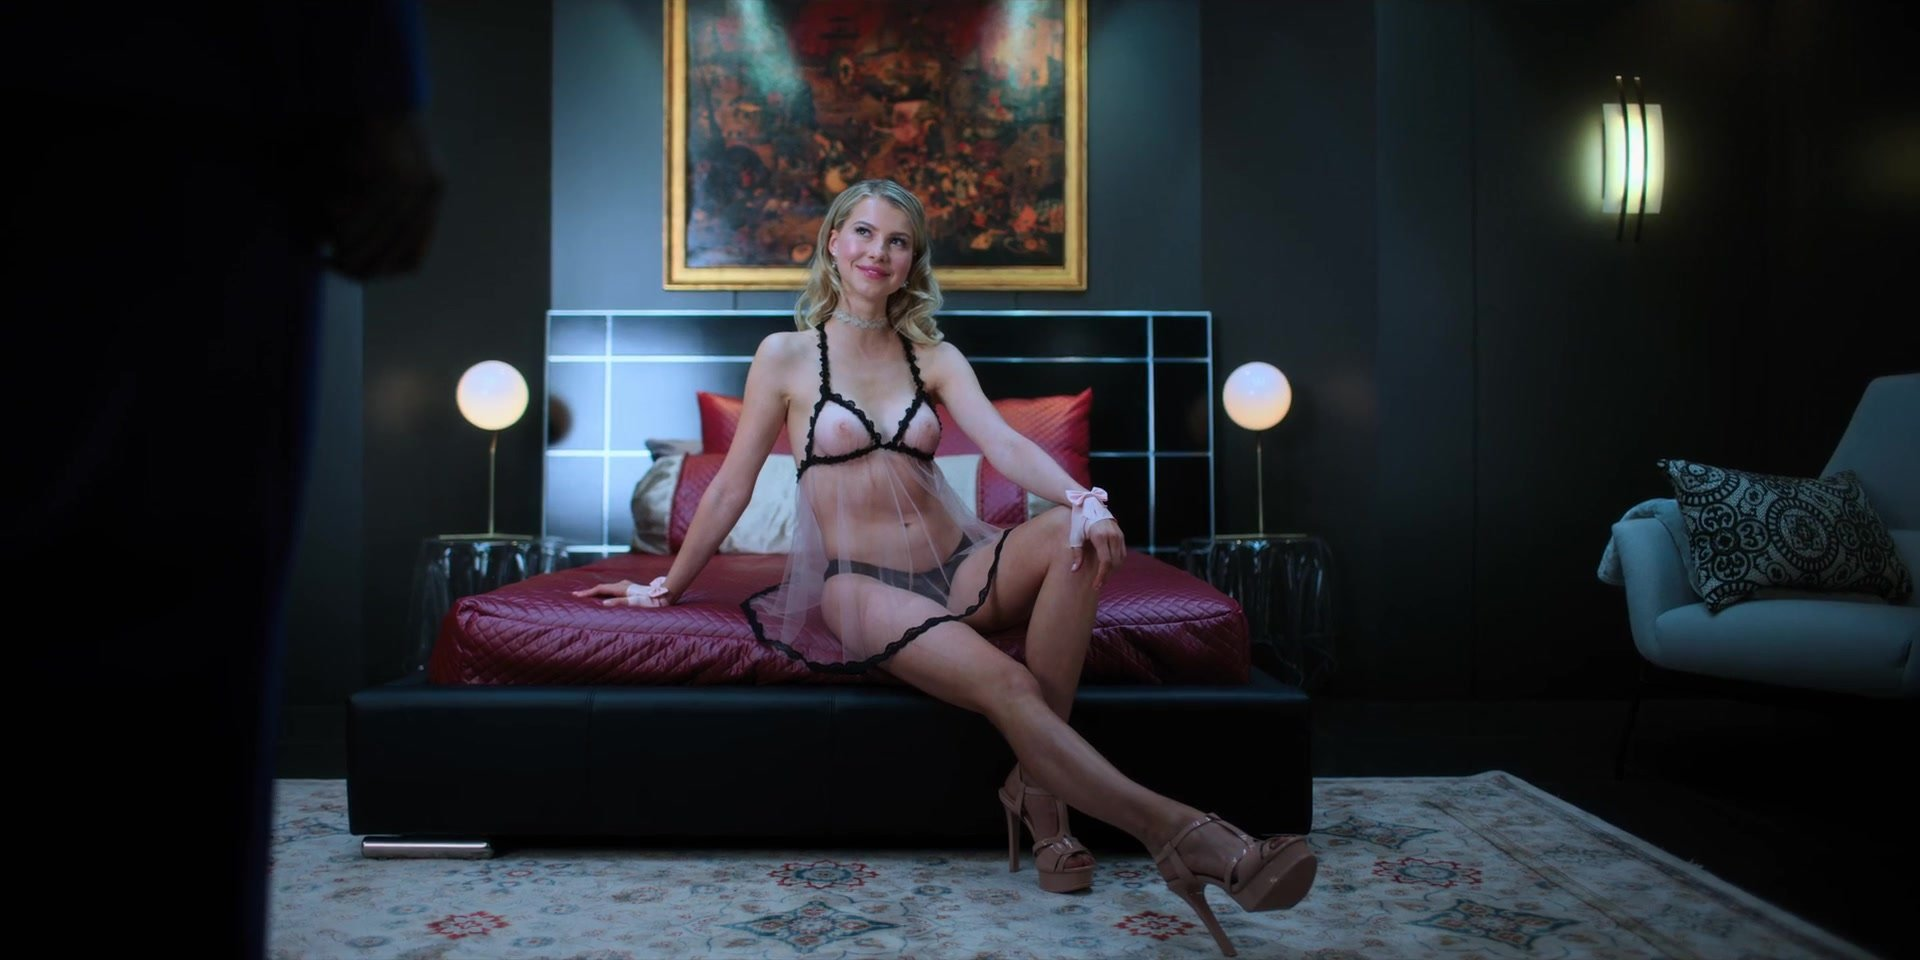 Martha Higareda, Kristin Lehman nude - Altered Carbon S01 E09 (2018)